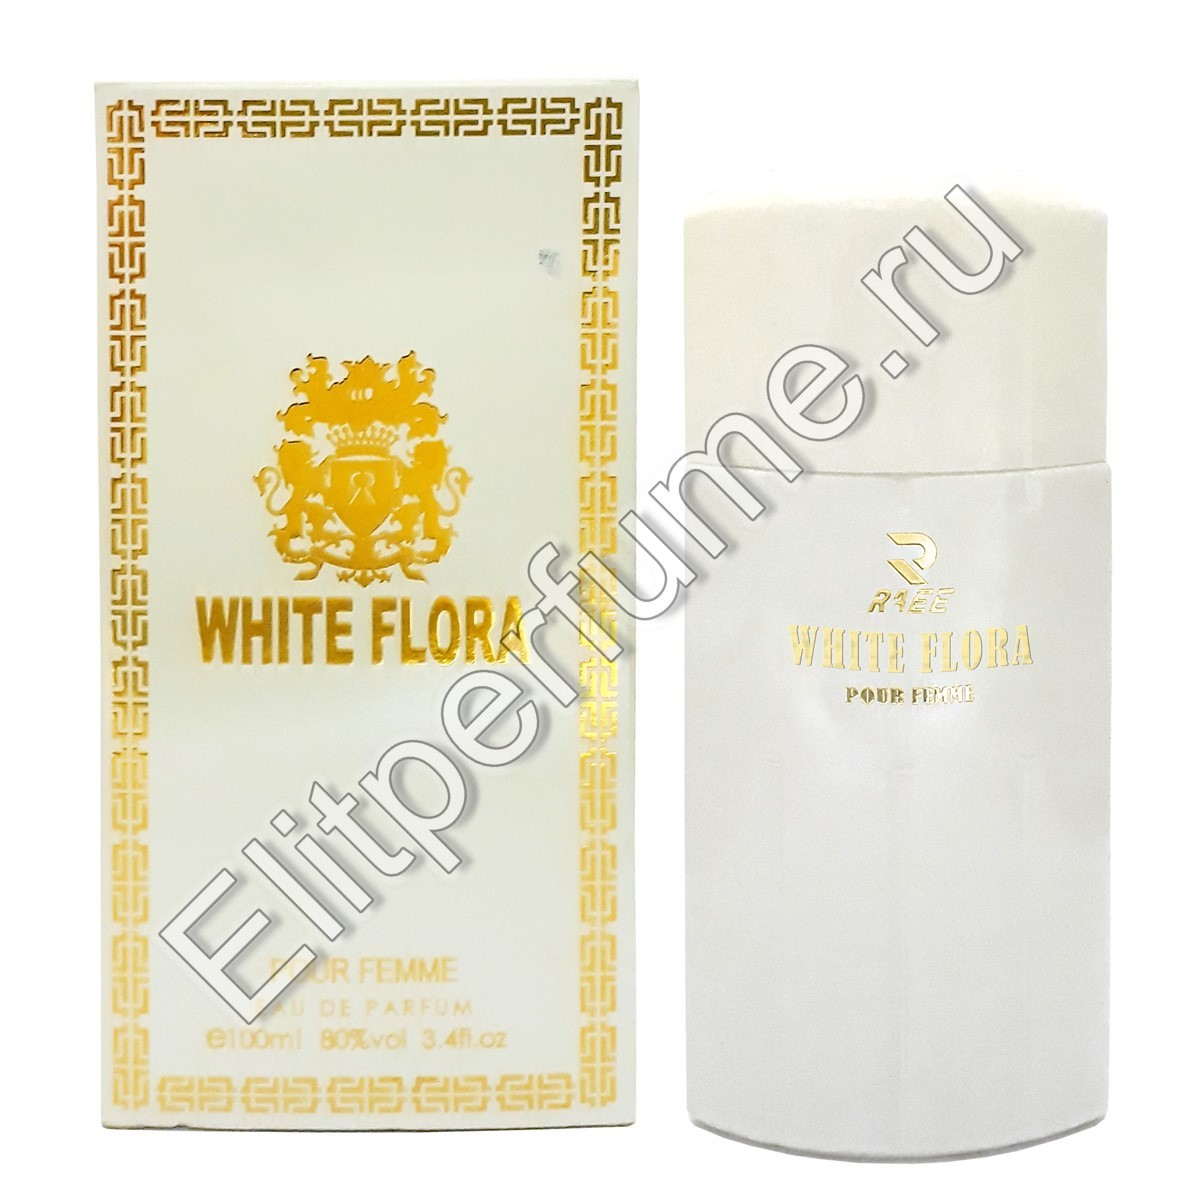 White Flora 100 мл спрей от Reev Khalis Perfumes Халис